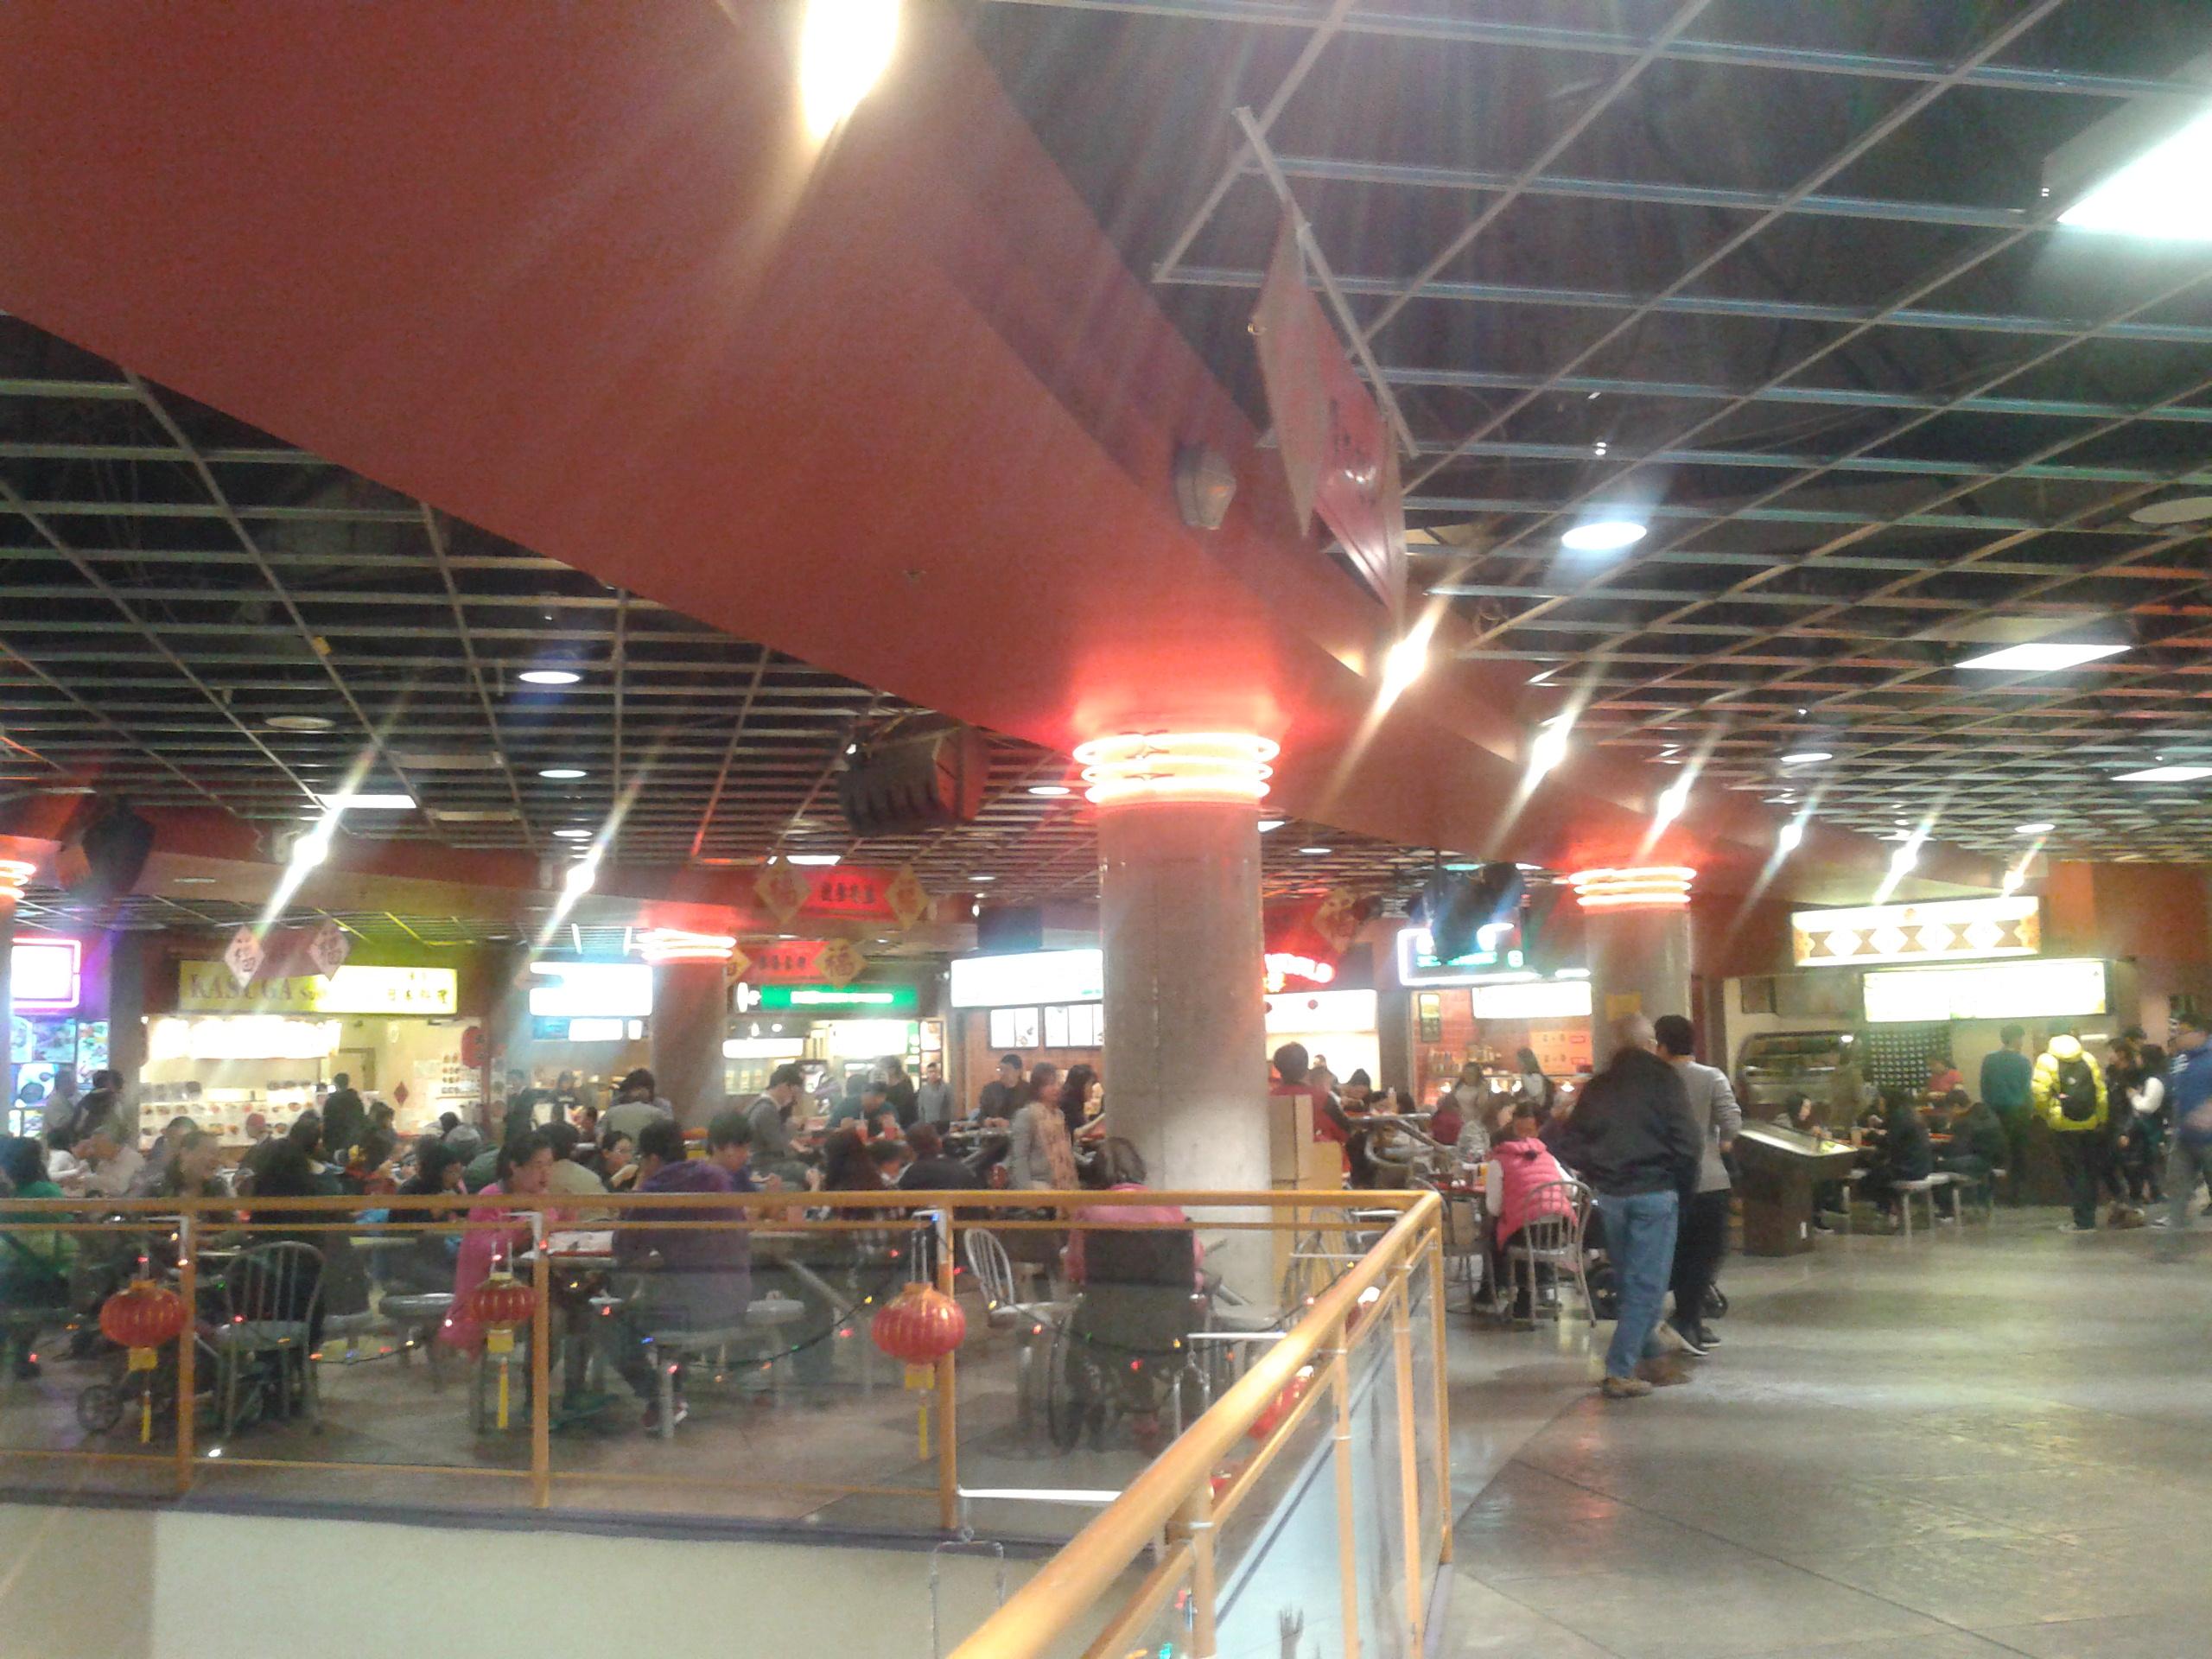 shiny food court